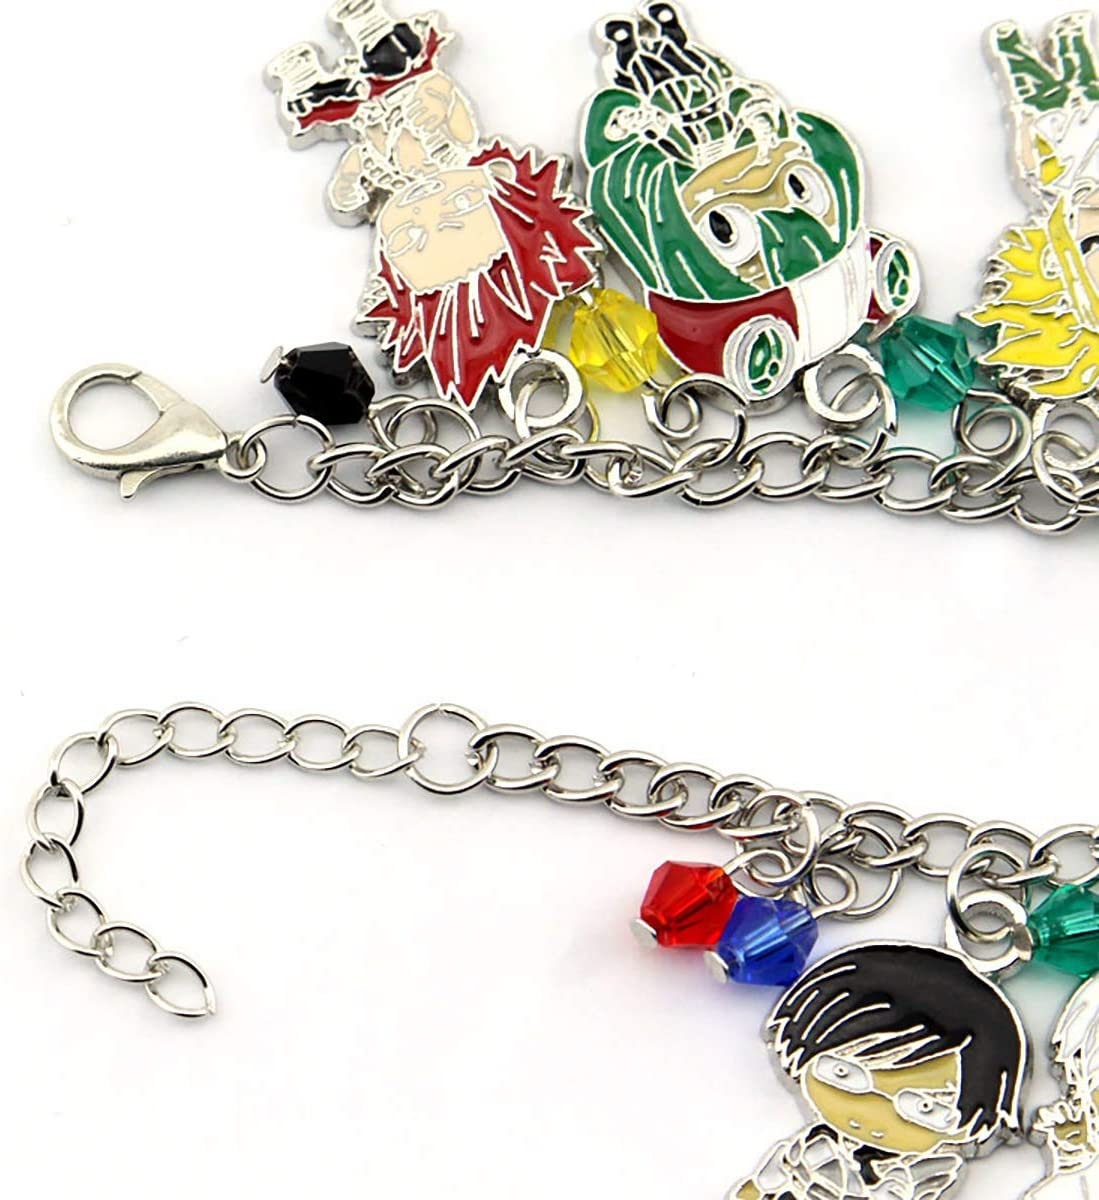 Good Friend bnha mha My Hero Academia Fashion Novelty Charm Bracelet The Best Choice for mha Fans Anime Manga Series Nine People Bracelet